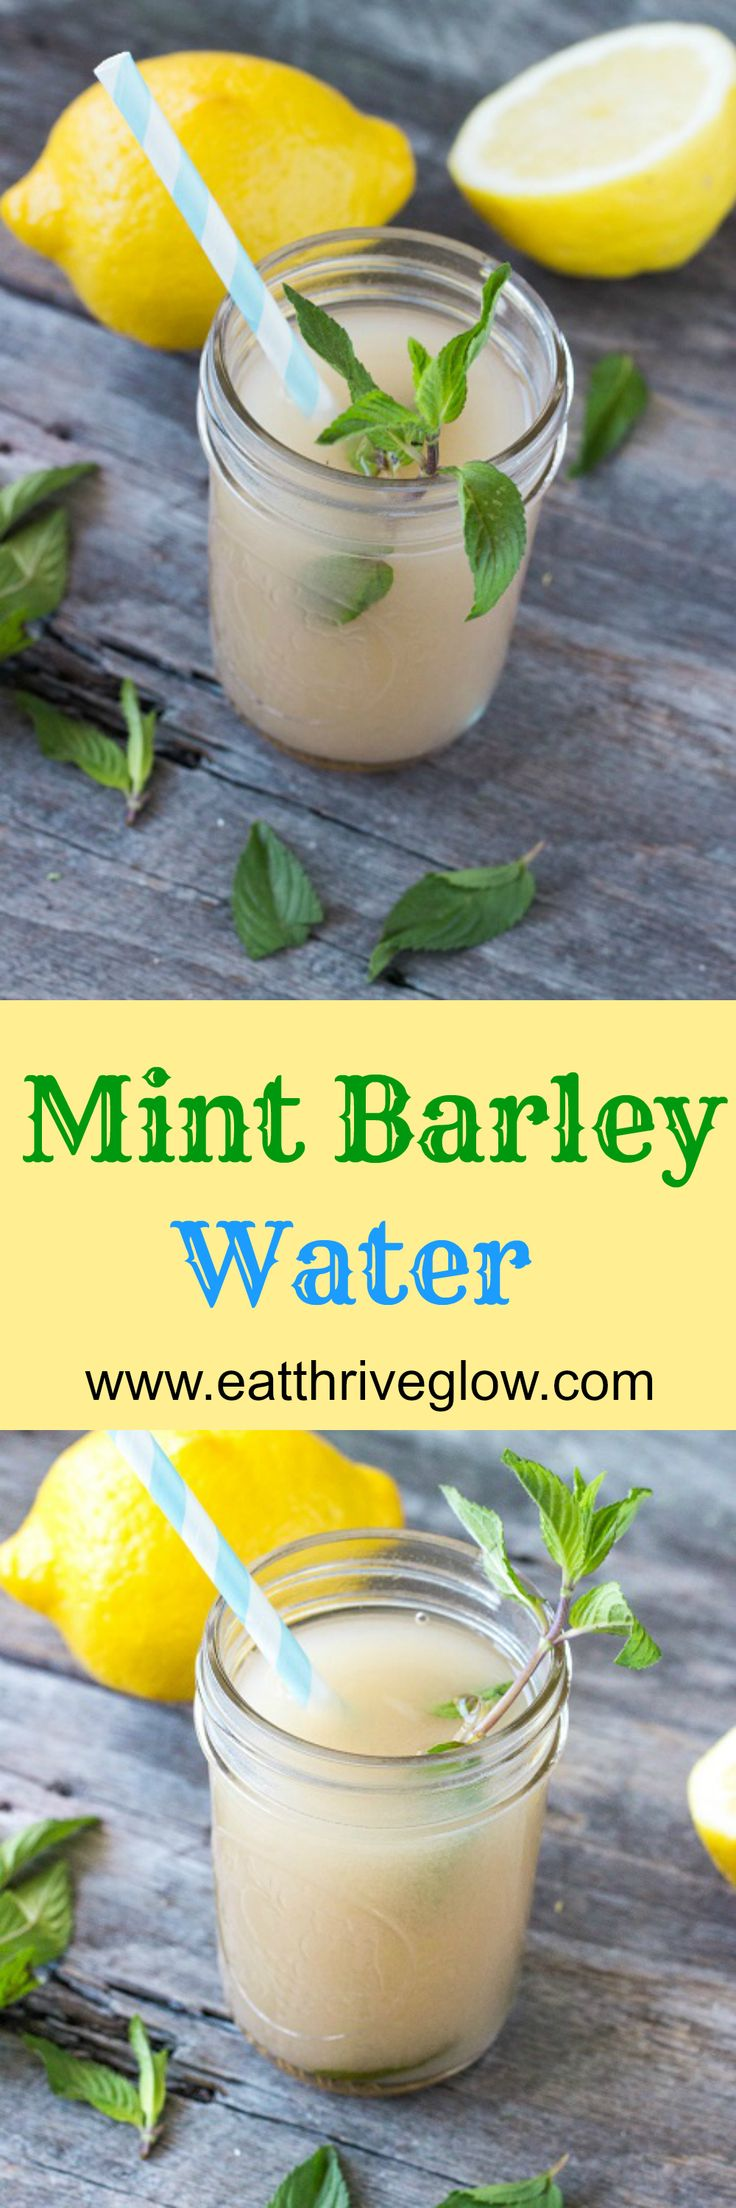 Mint Barley Water (Ancient Greek Kykeon) Recipe Barley